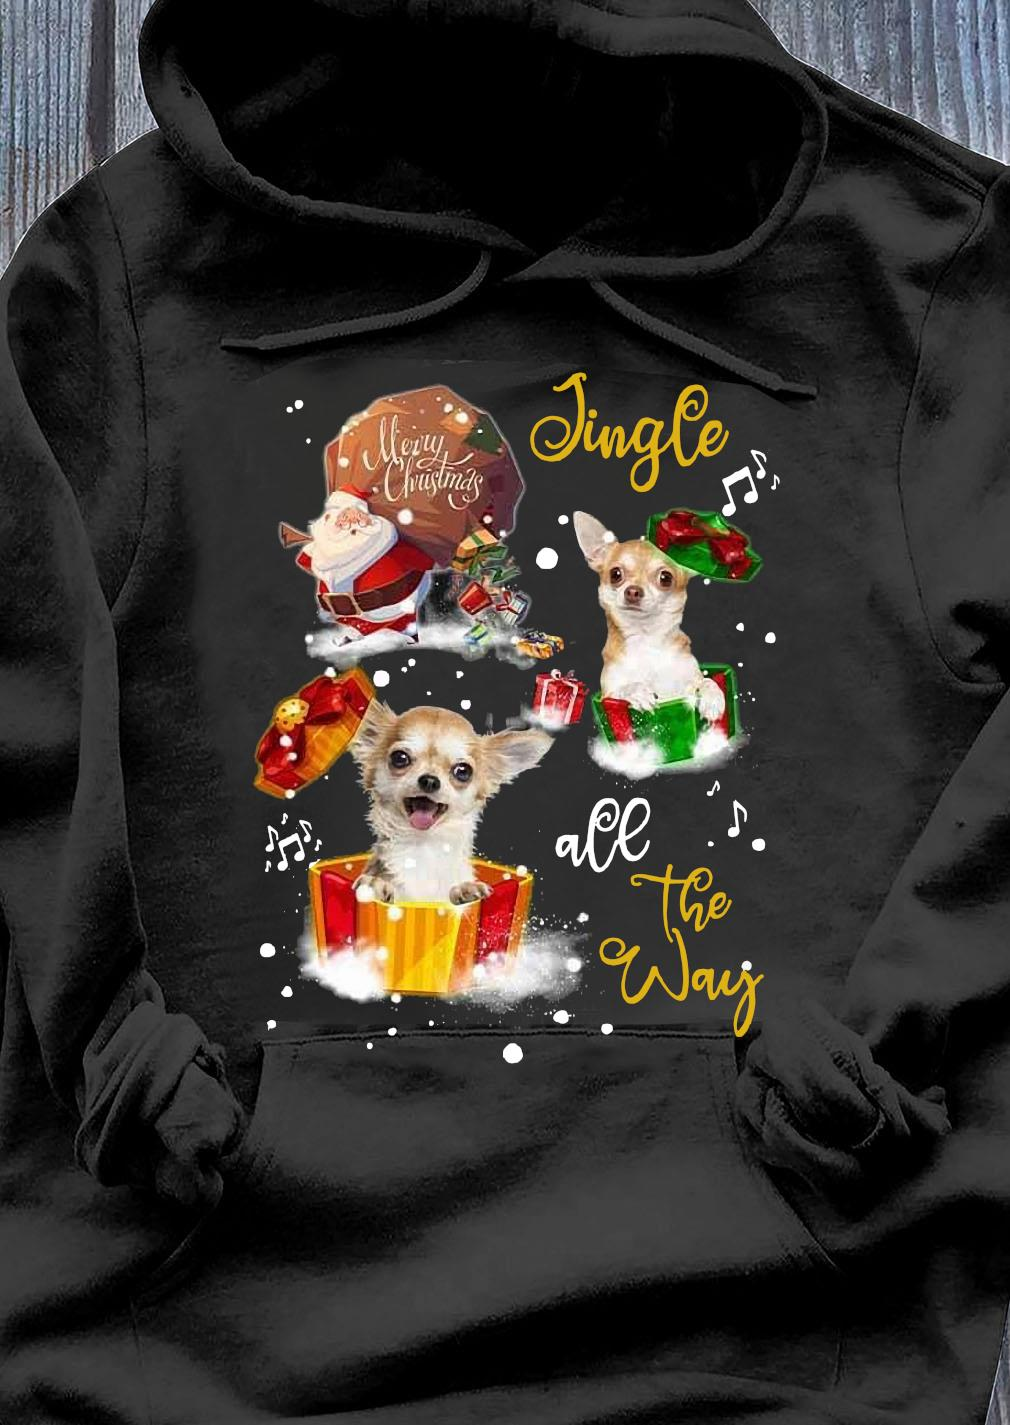 Merry Christmas Jingle All The Way Shirt Hoodie